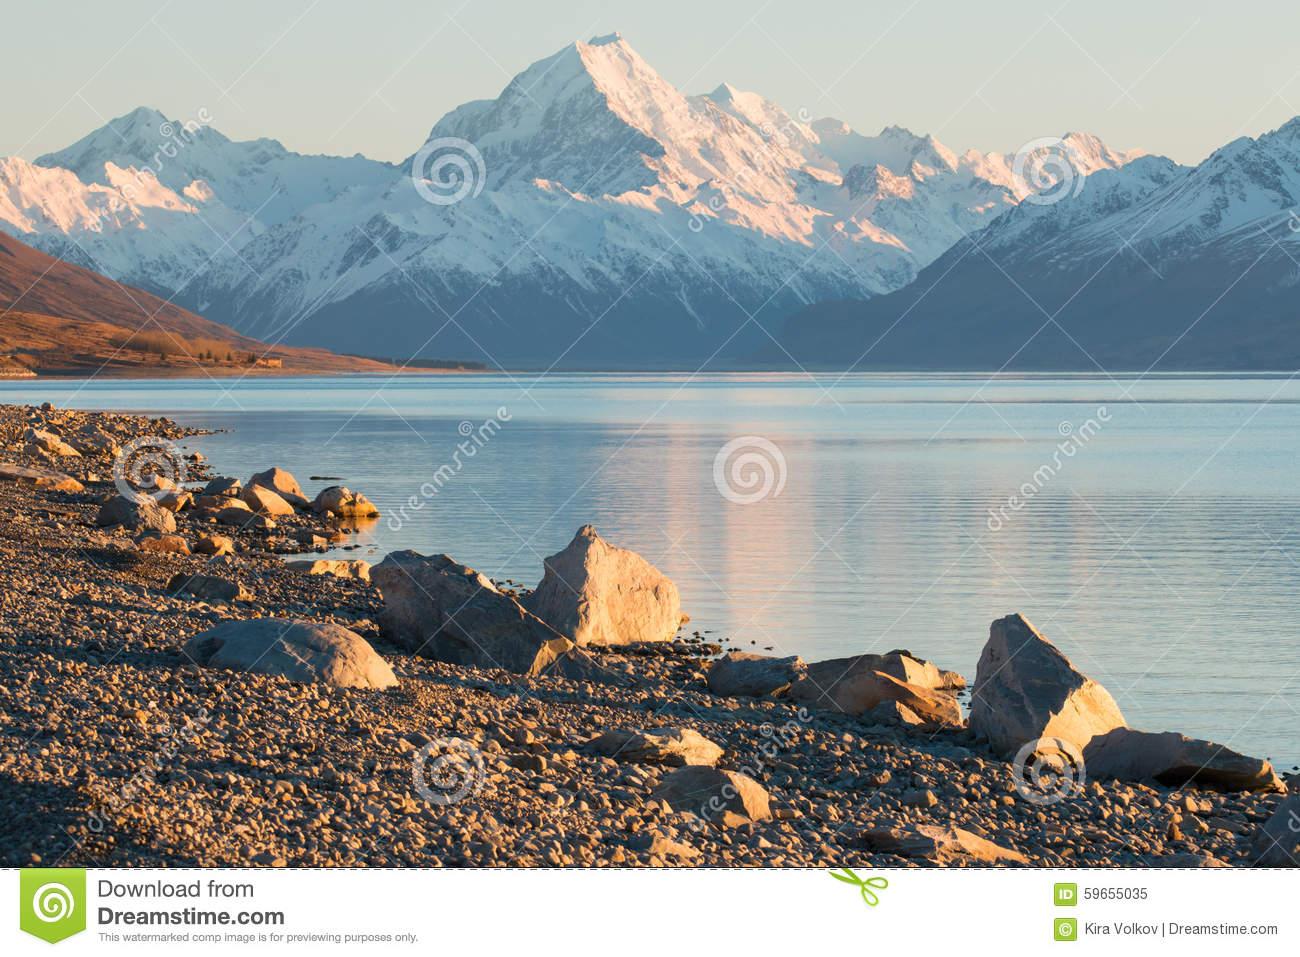 Iconic Mountain Of New Zealand Mt. Cook / Aoraki At Sunrise Stock.